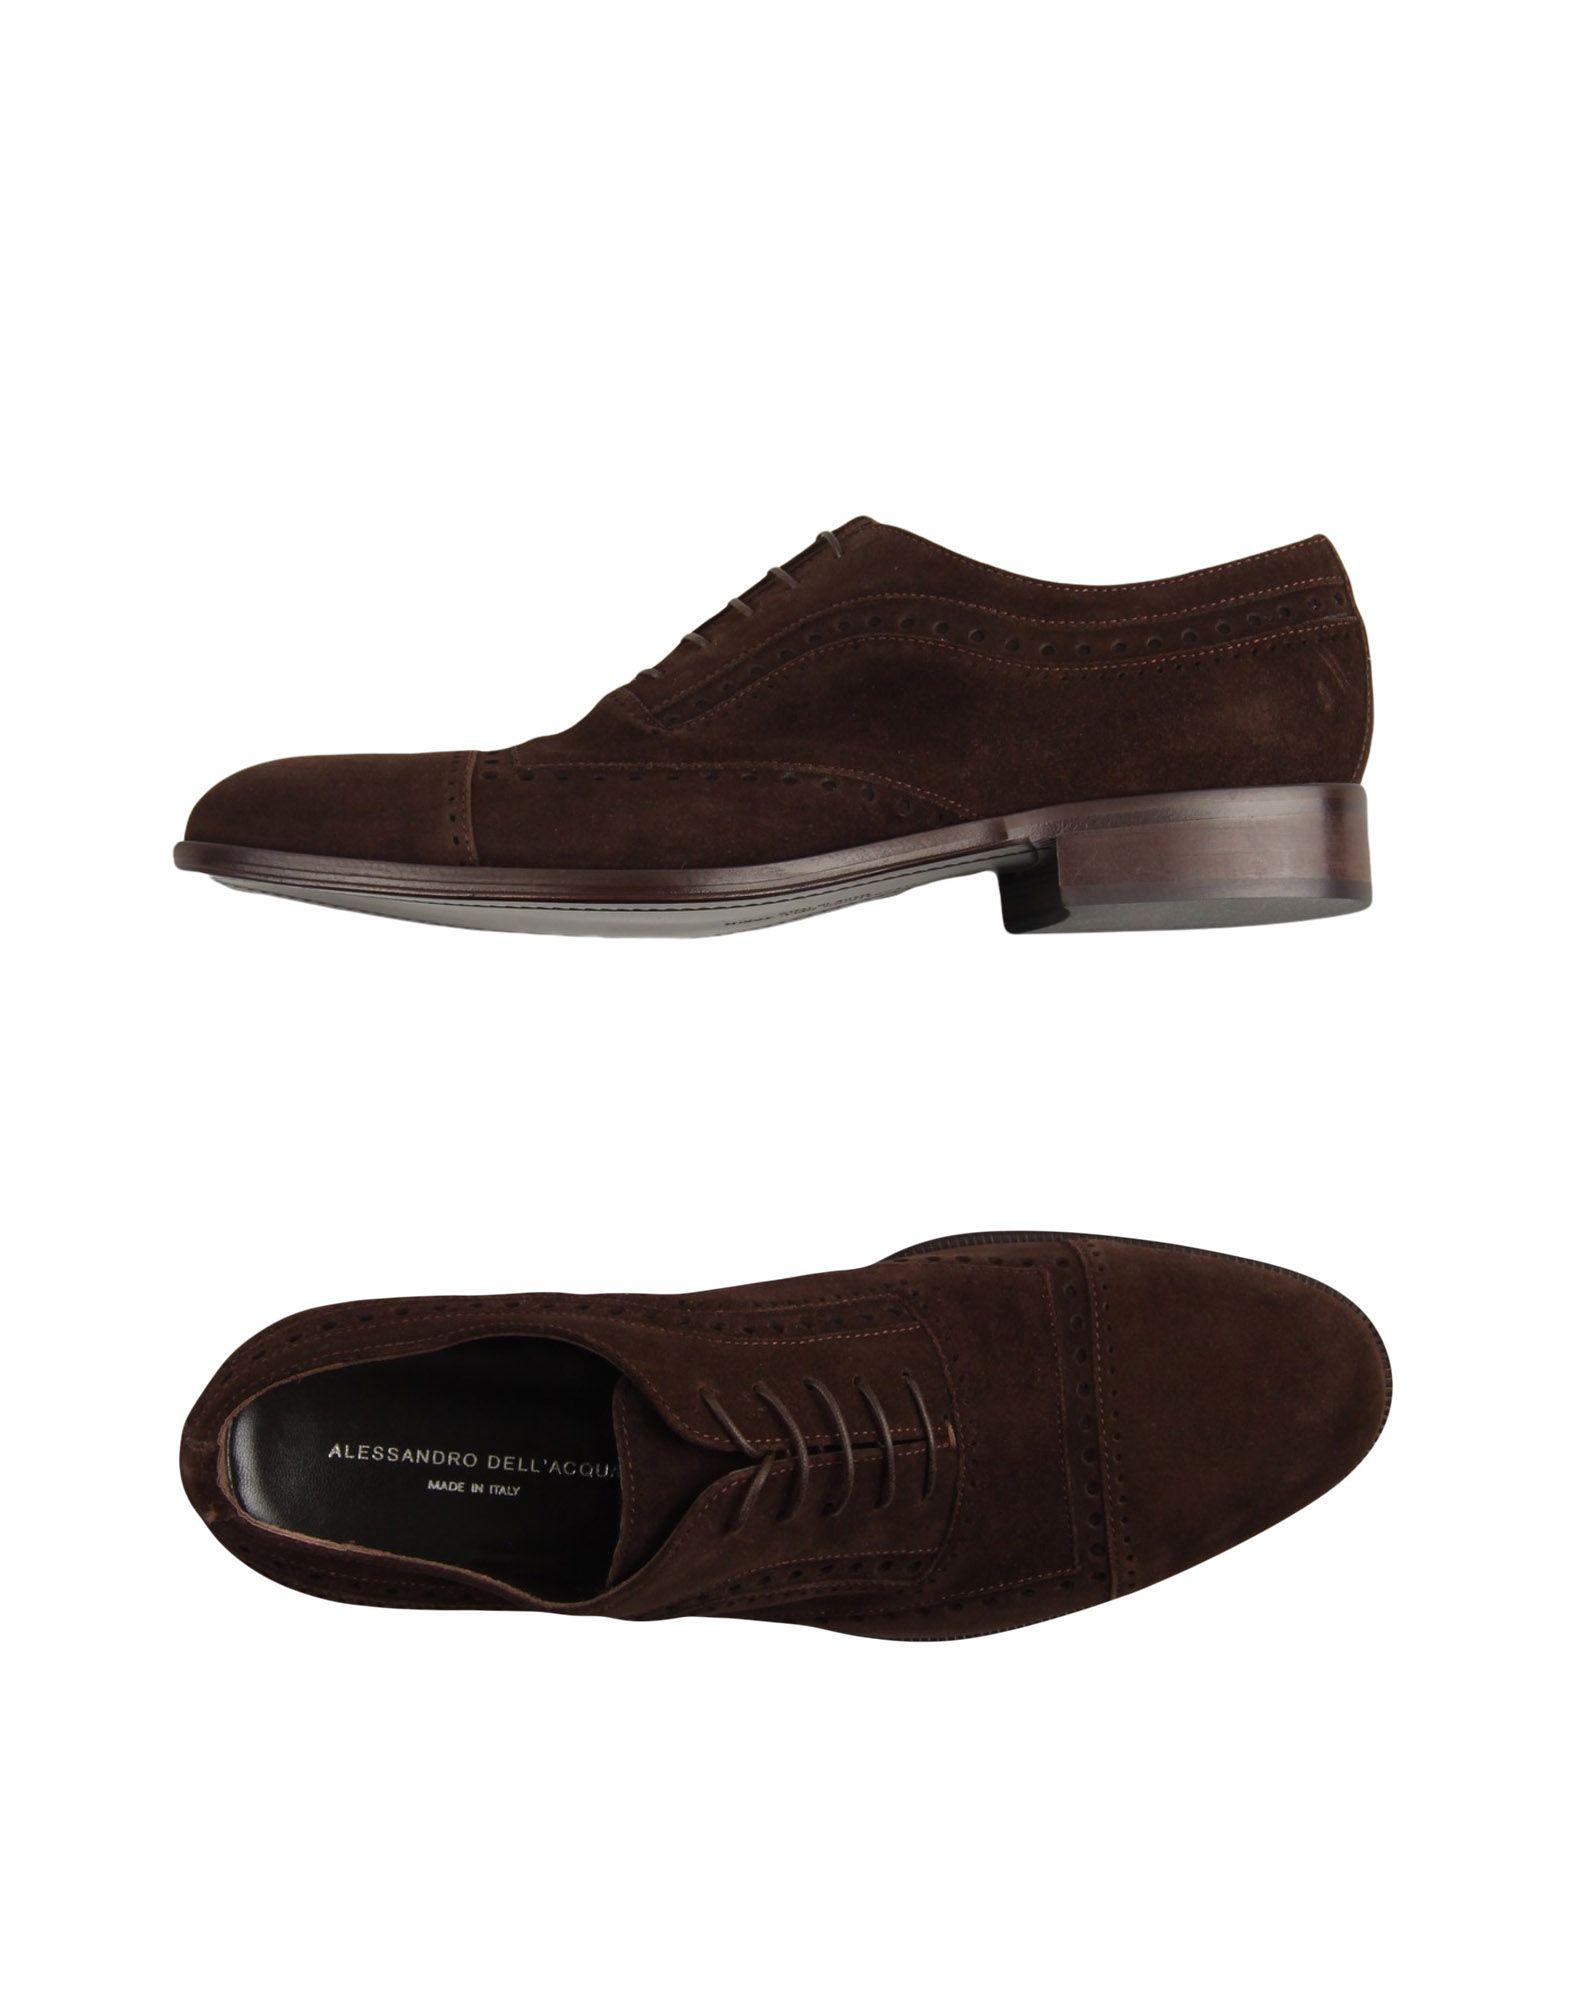 Chaussures À Lacets Alessandro Dell'acqua Homme - Chaussures À Lacets Alessandro Dell'acqua   - 11536522CE